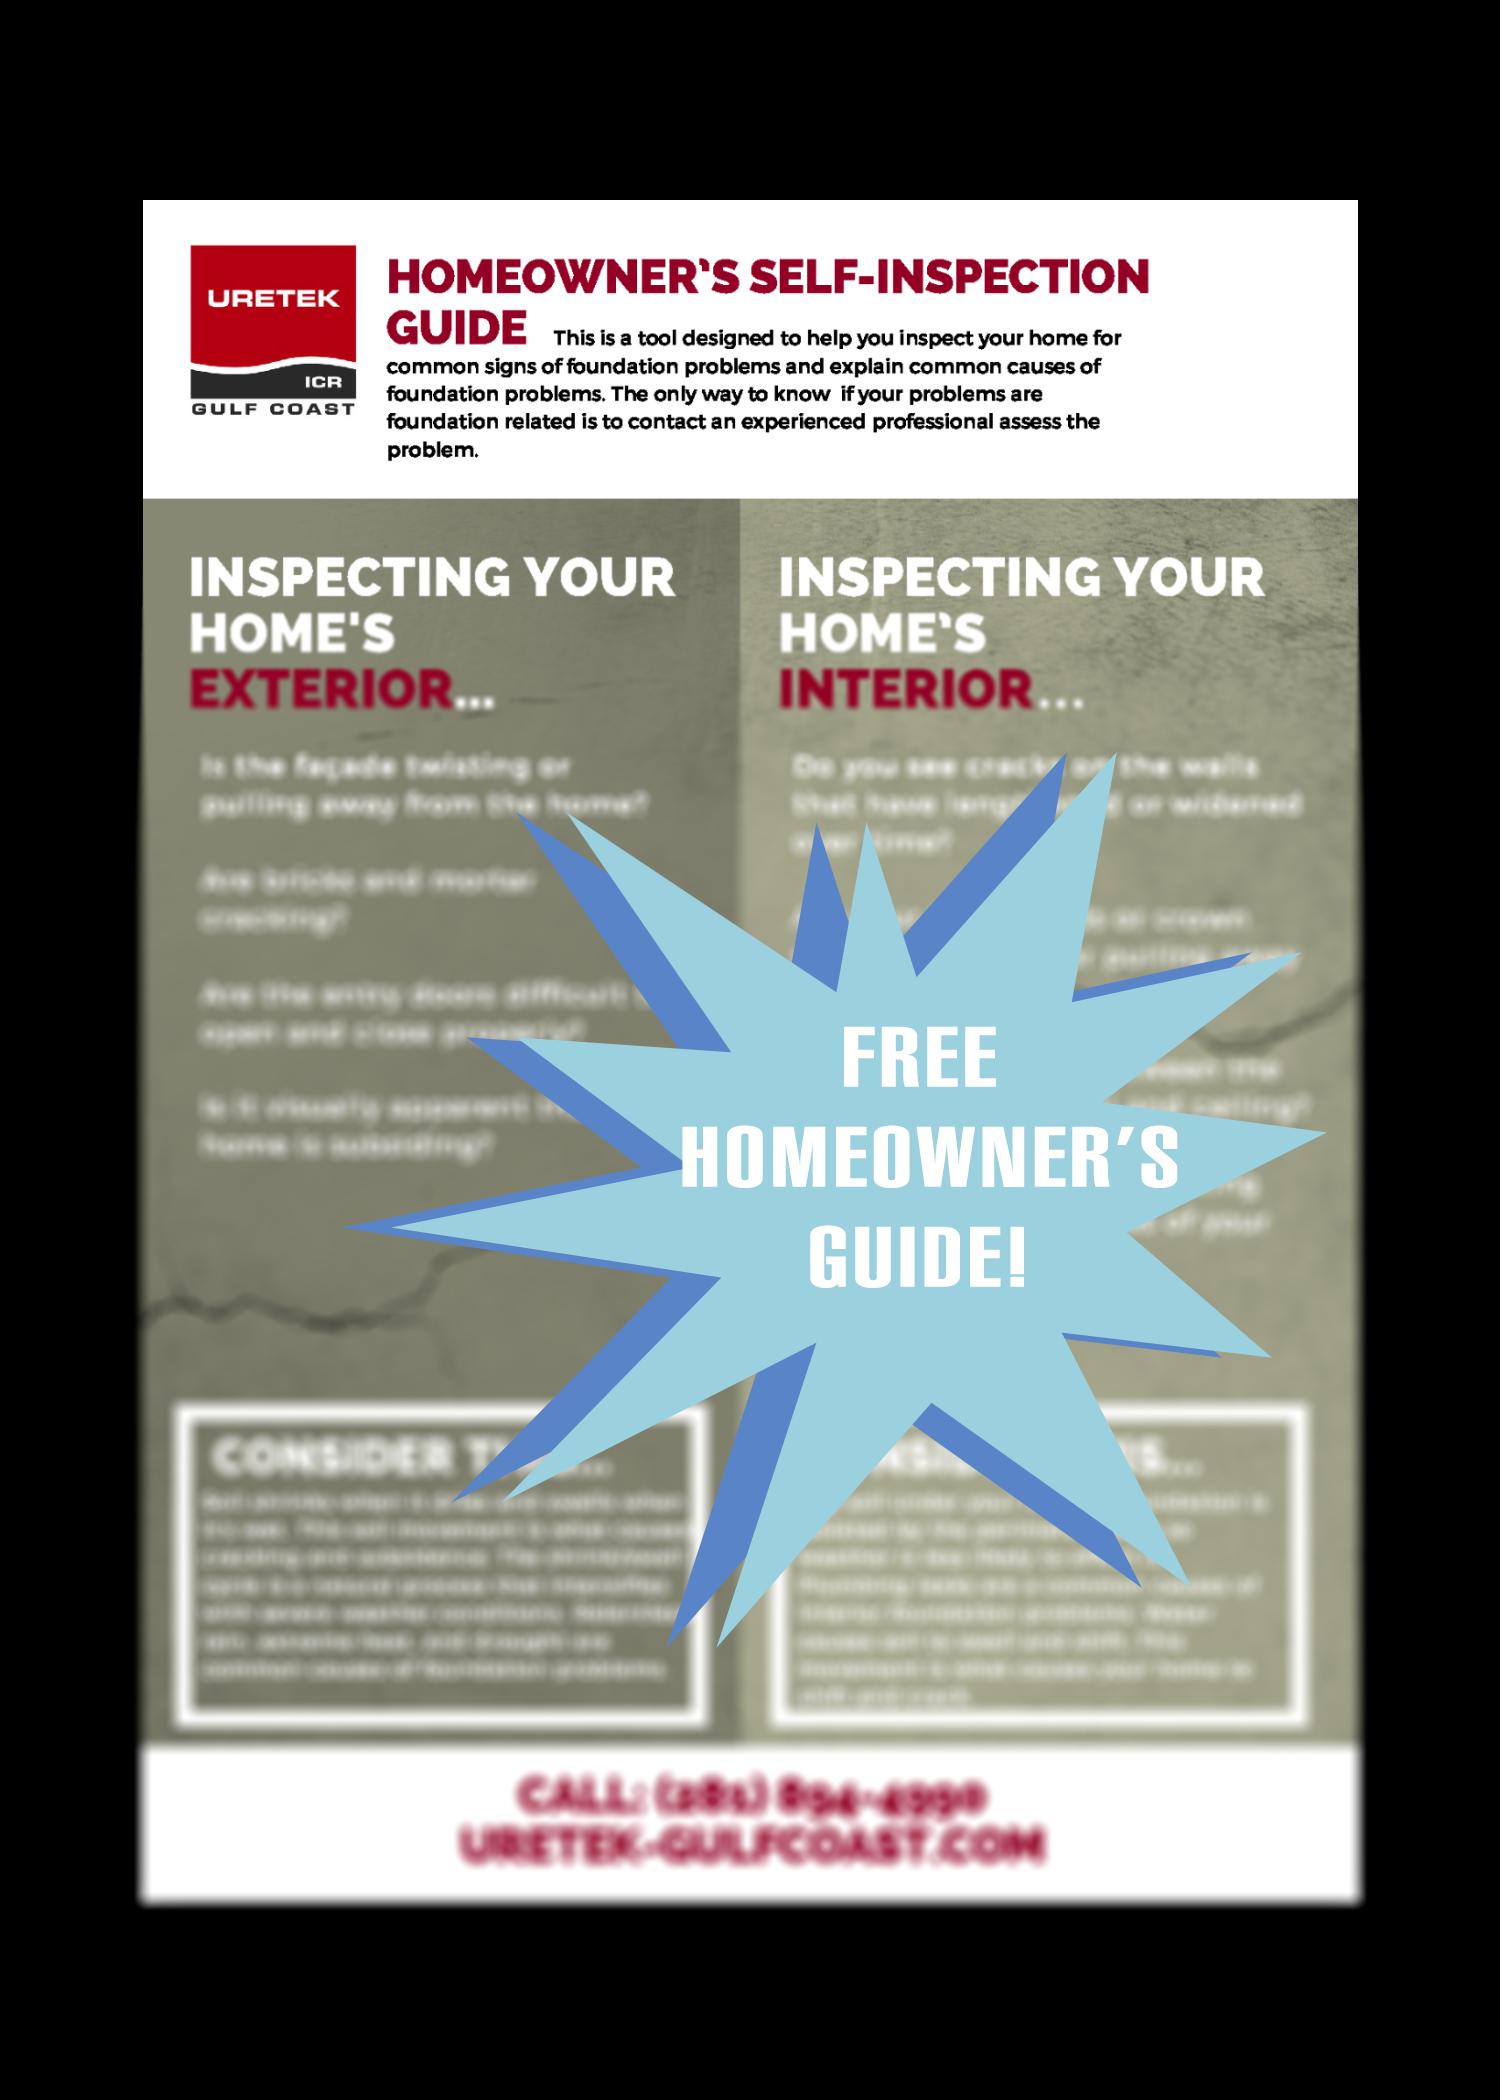 Homeowner's Self-inspection Checklist